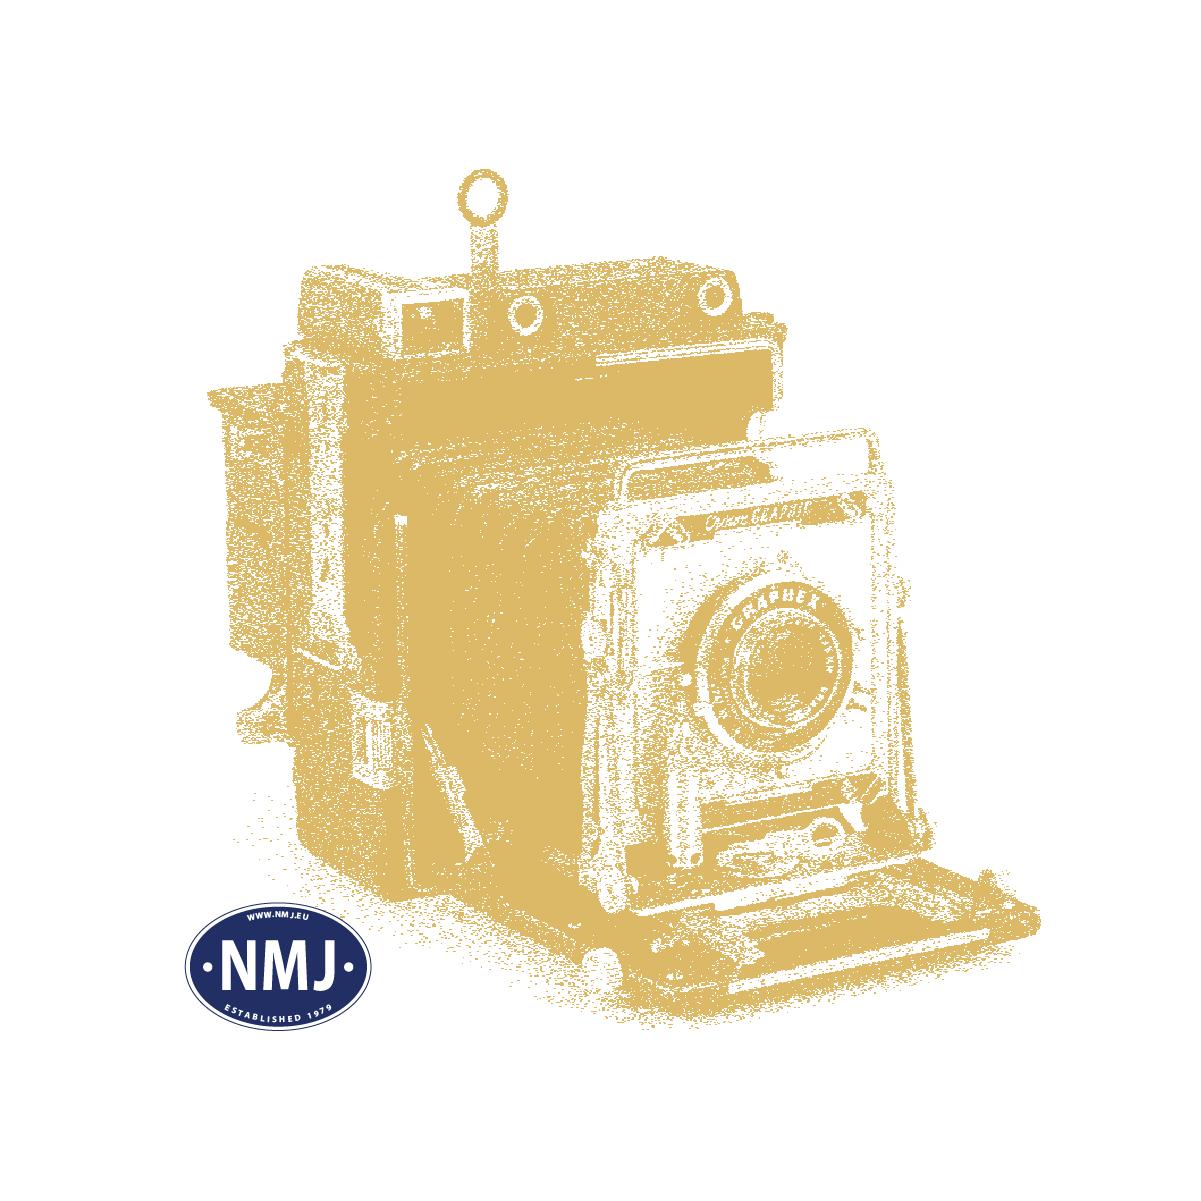 NMJT132.103 - NMJ Topline NSB B4 25954, rotbraun